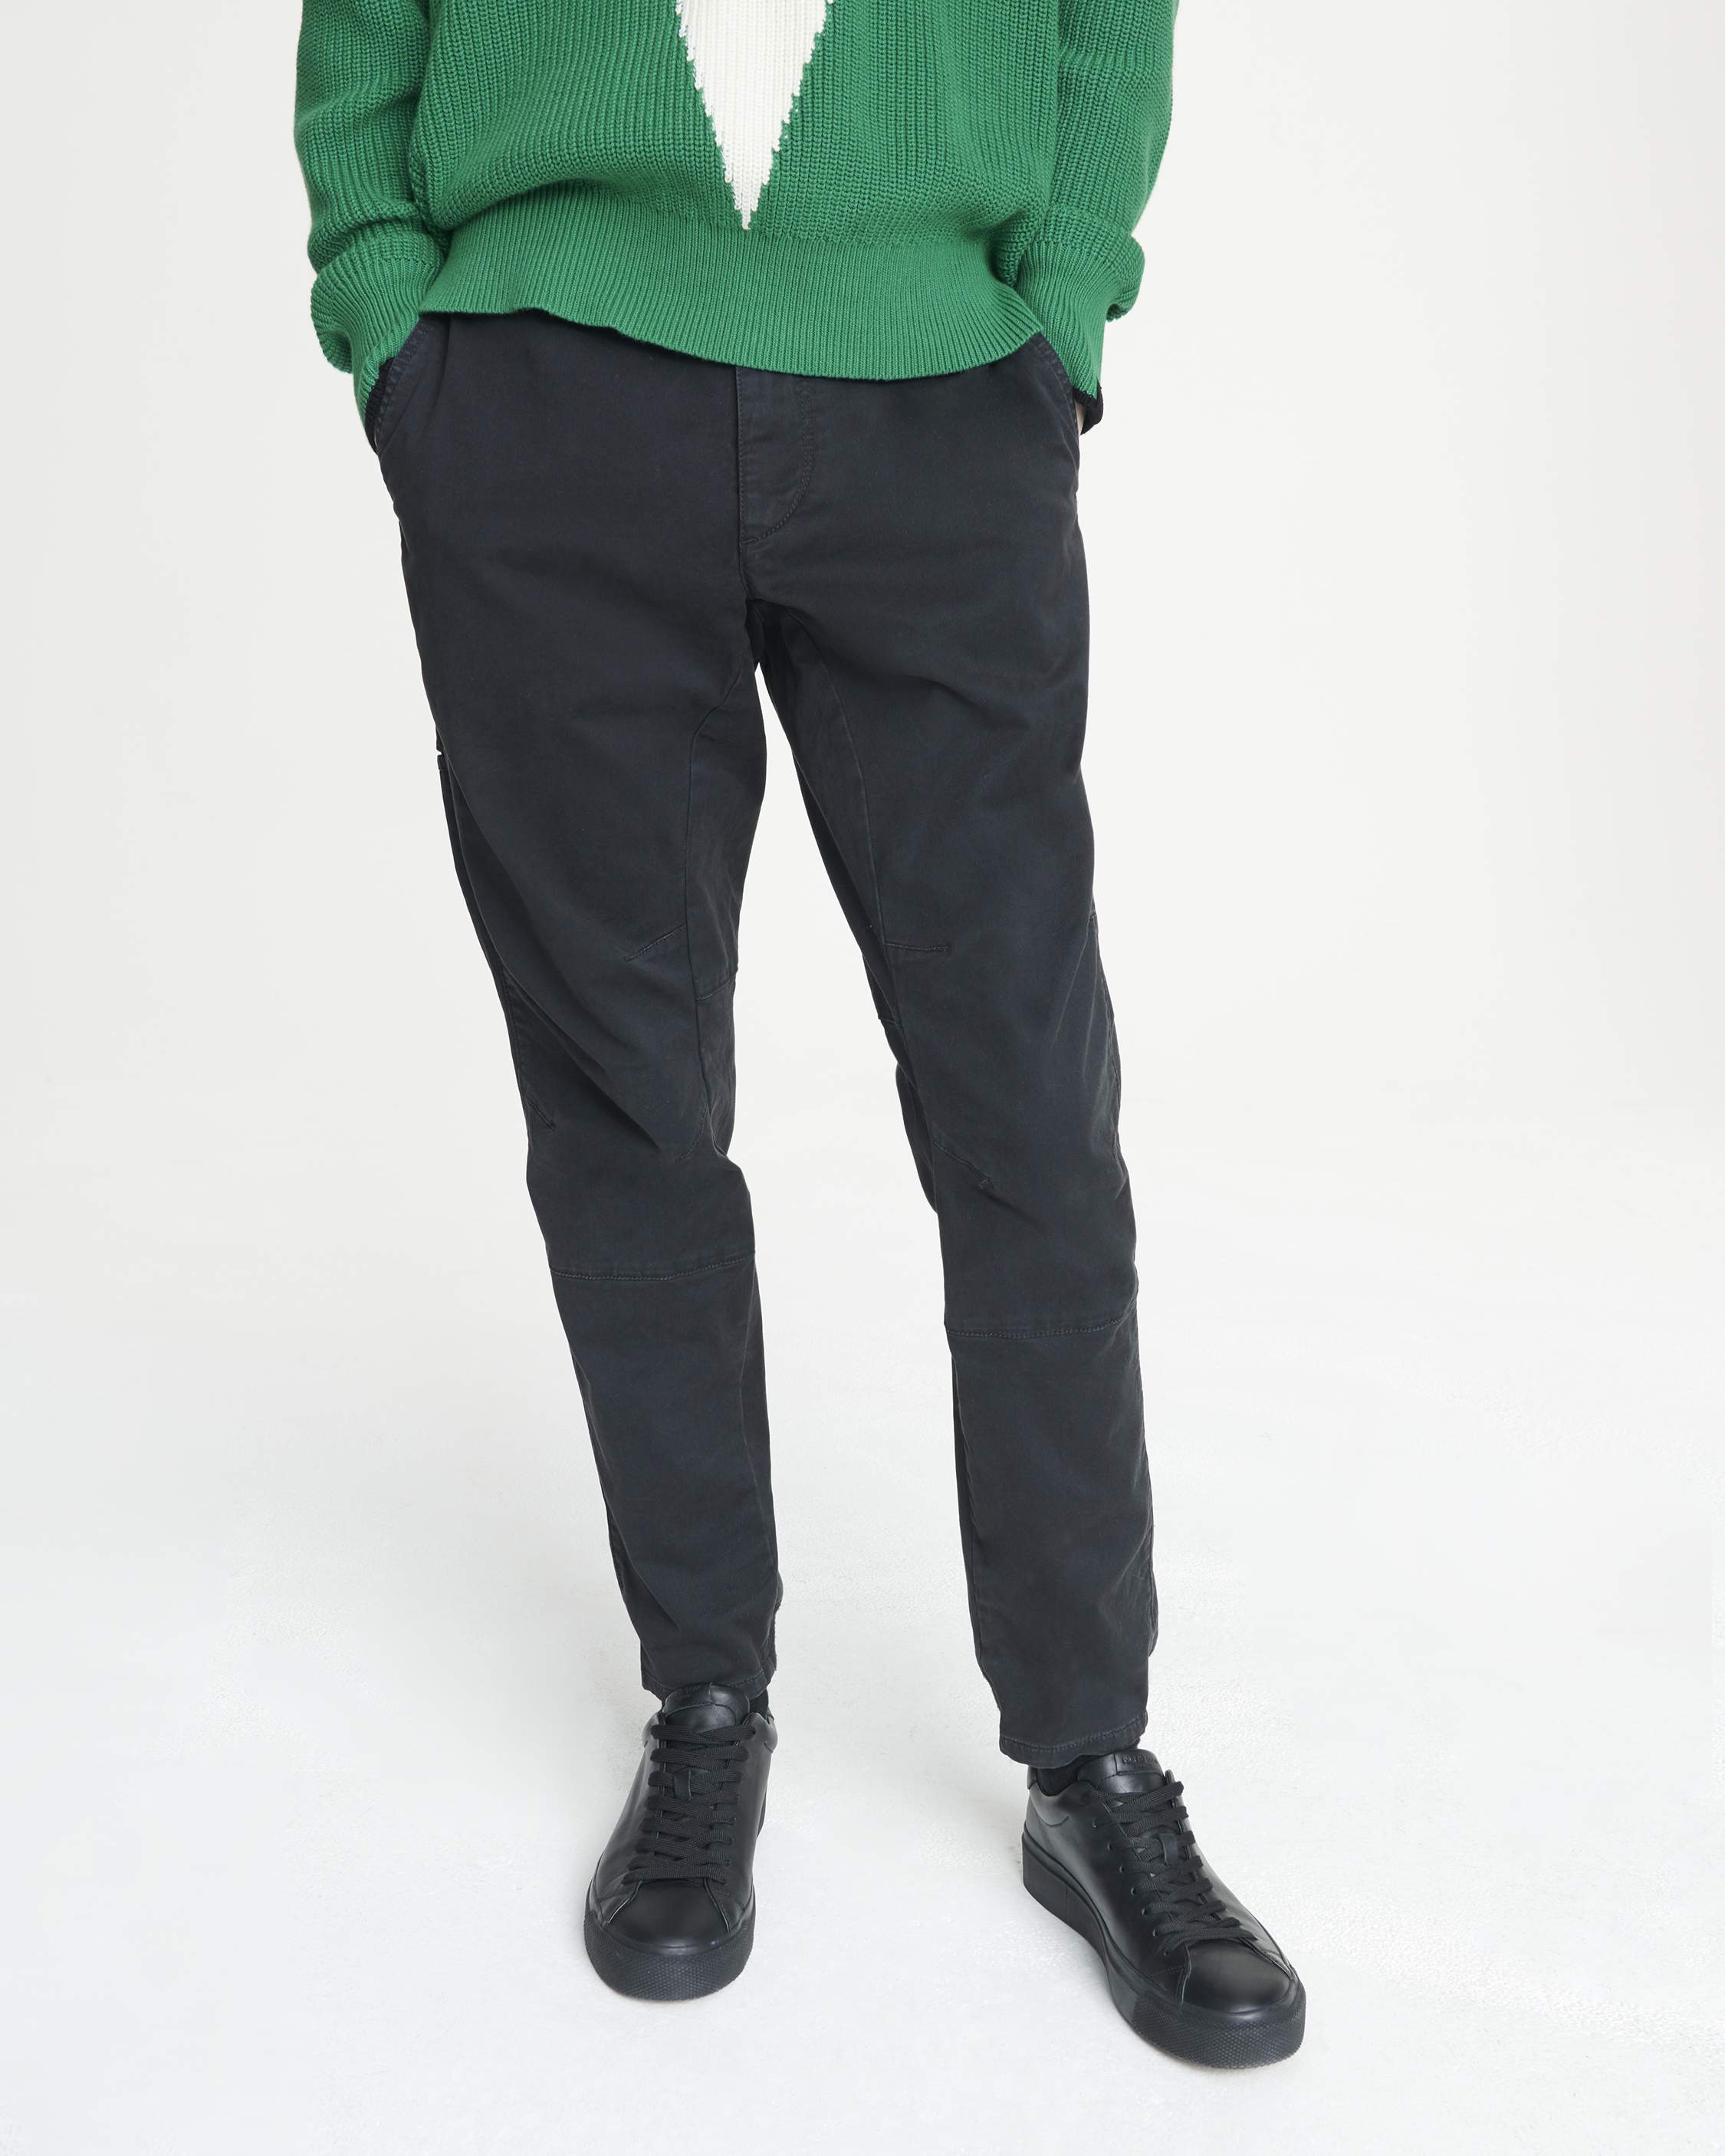 Rag Bone Articulated Chino Ryan Reynolds - 一件T-Shirt穿18年!Ryan Reynolds 最爱的时尚单品